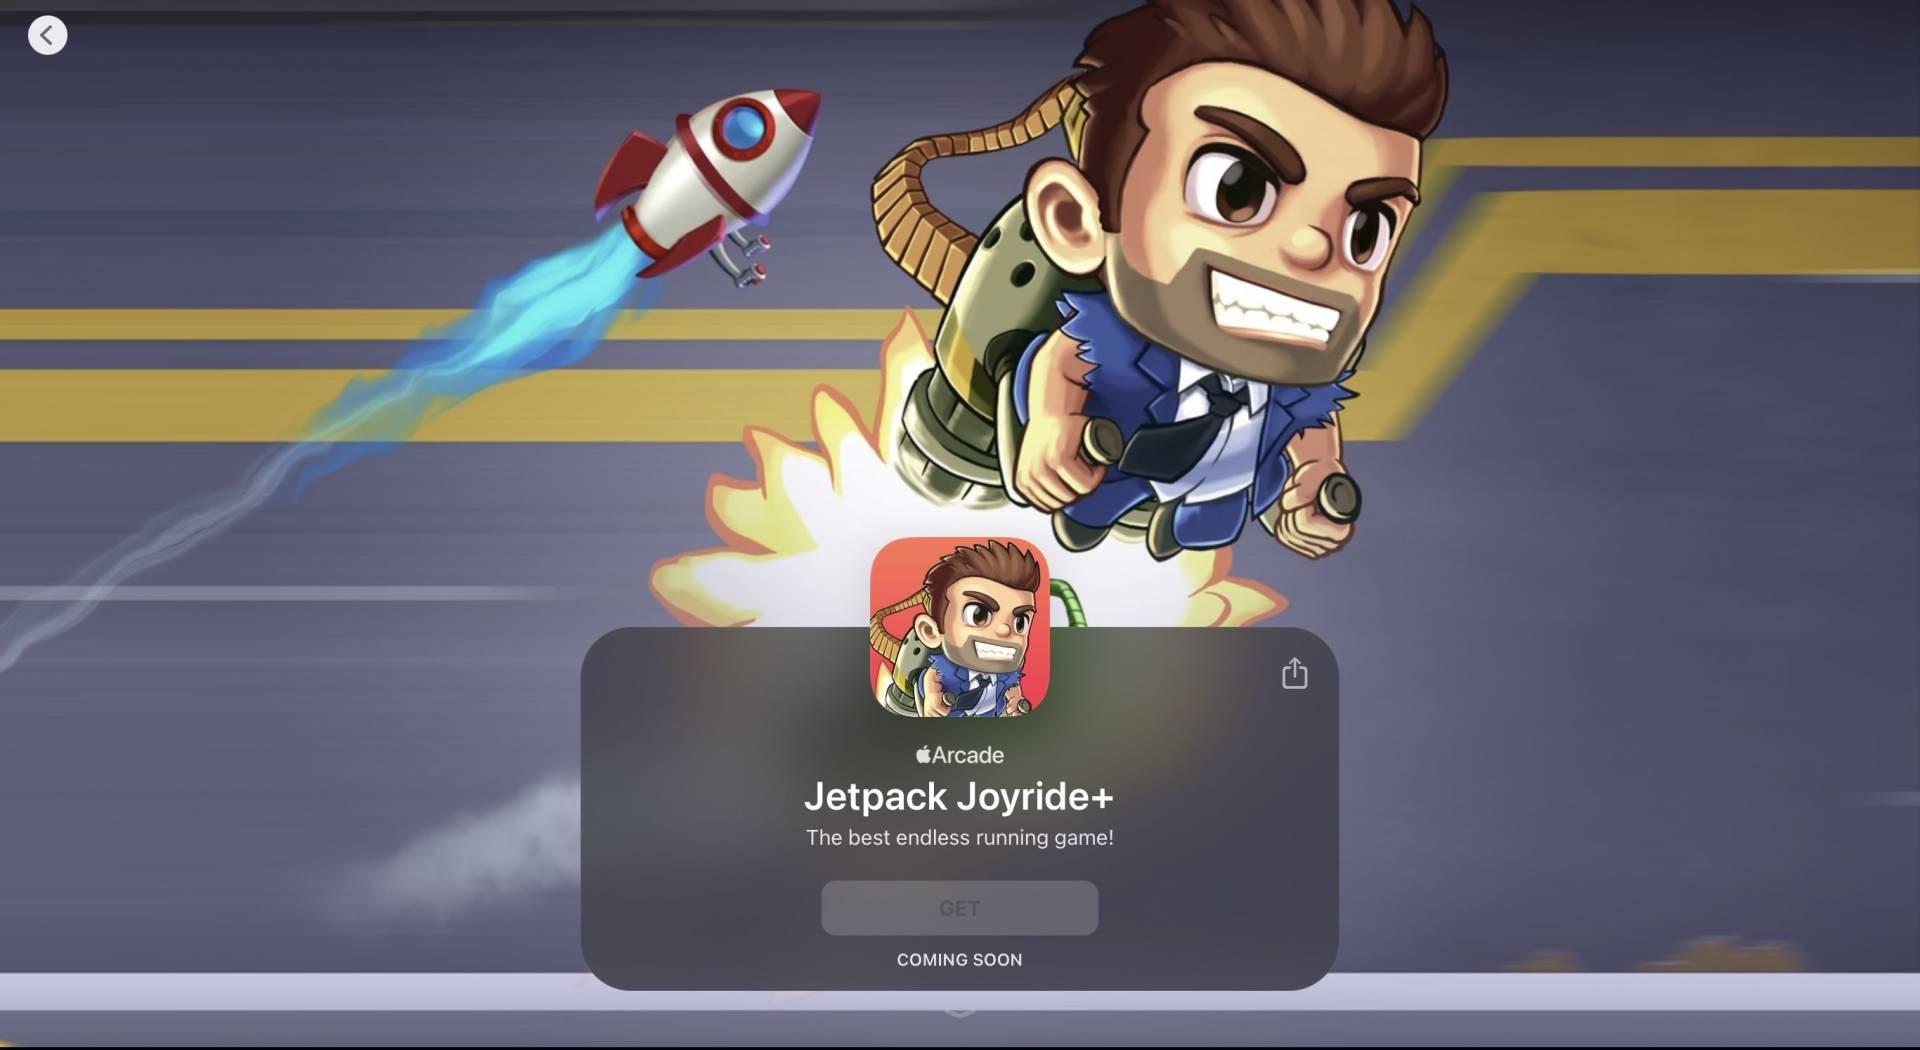 Jetpack Joyride +